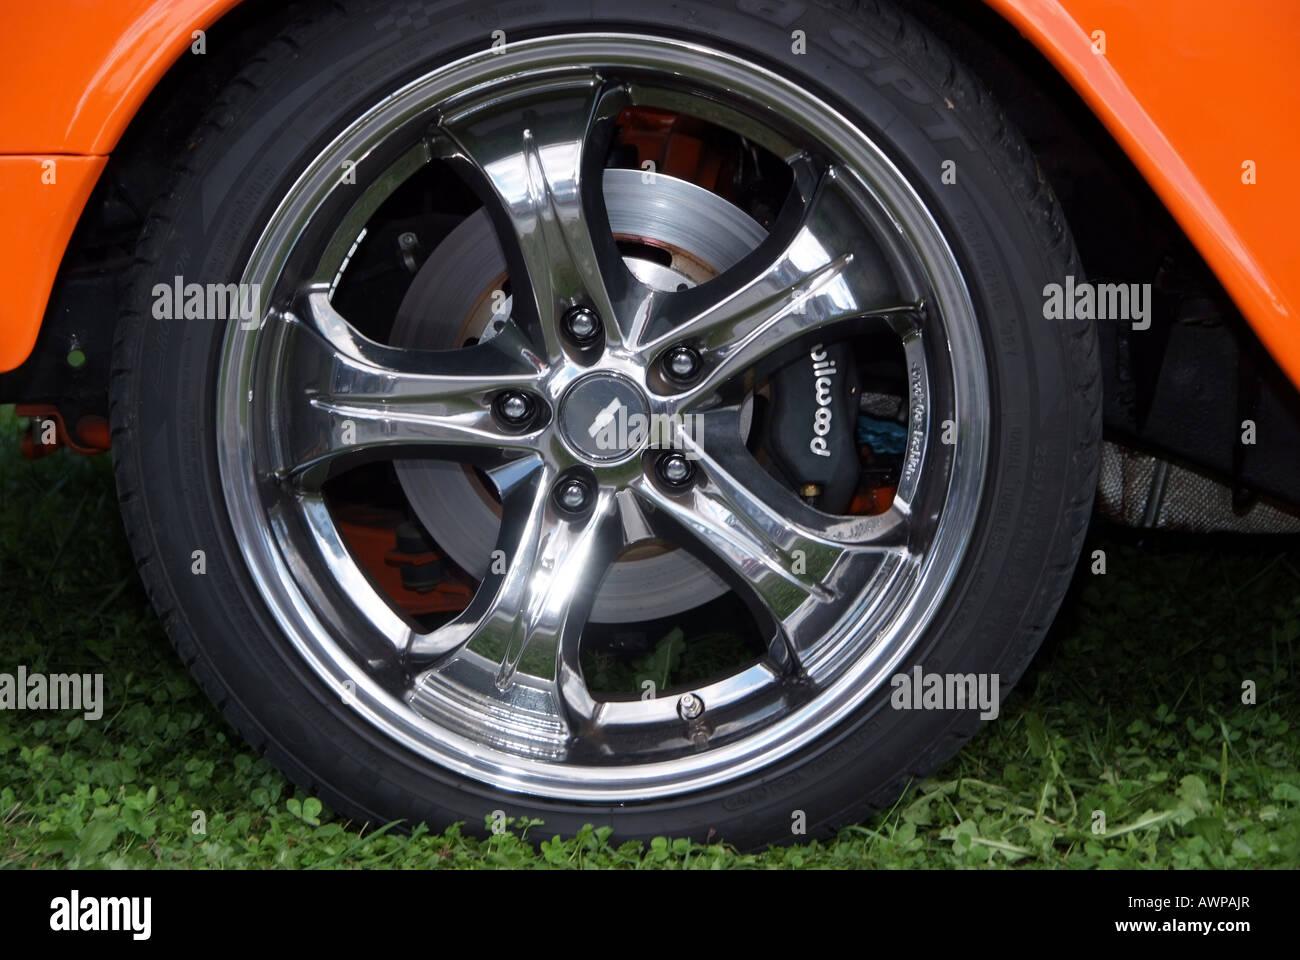 Auto Autoreifen Autos Fahrzeug Fahrzeuge Hot Rod Oldtimer Reifen Ve